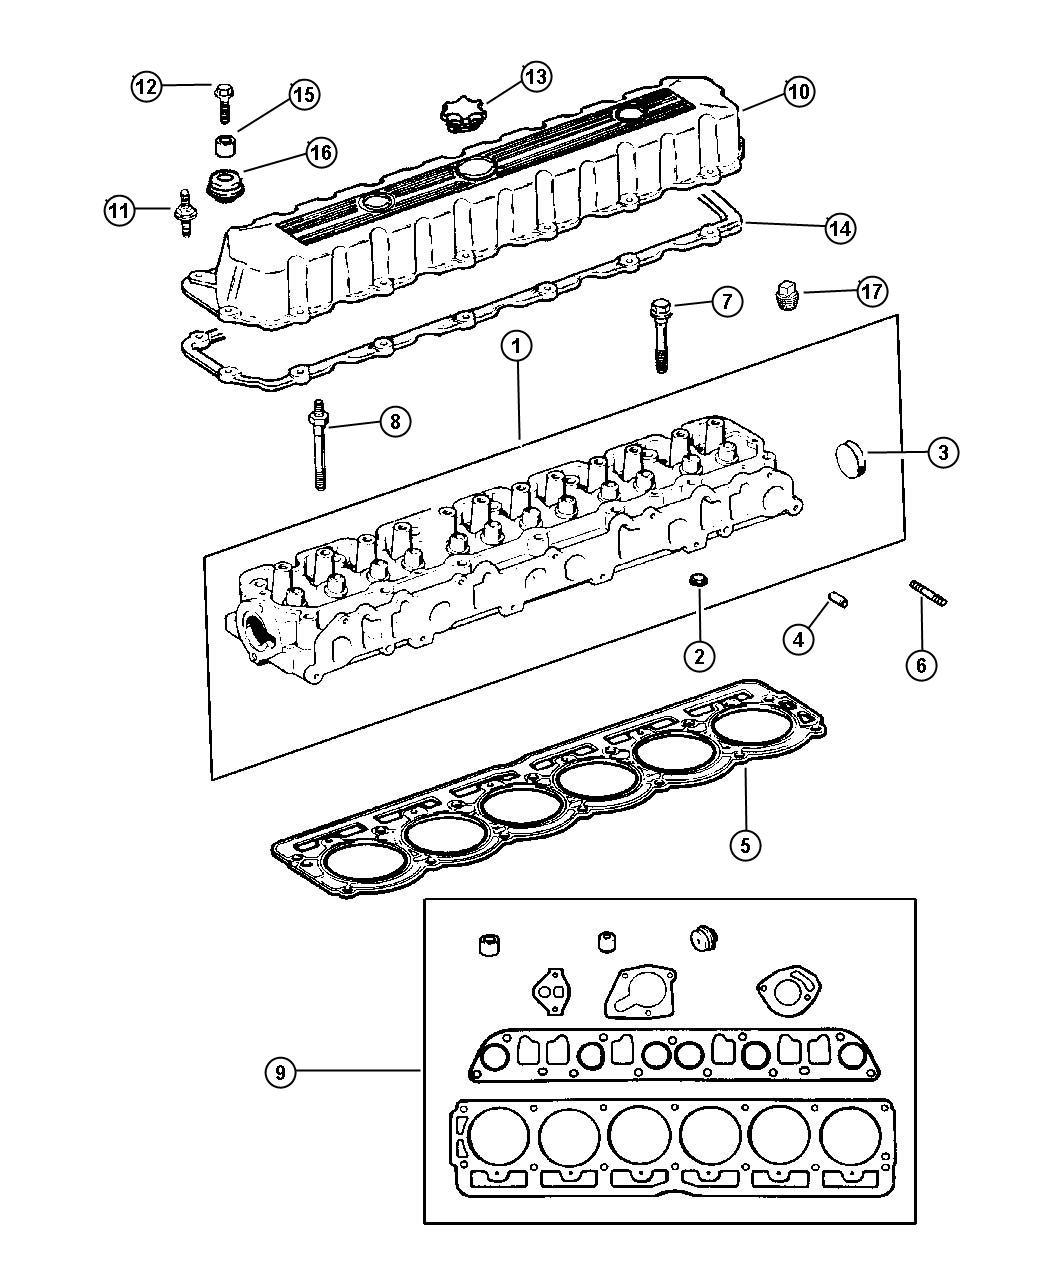 2008 dodge nitro engine diagram wiring warn winch remote egr valve location for 4 auto